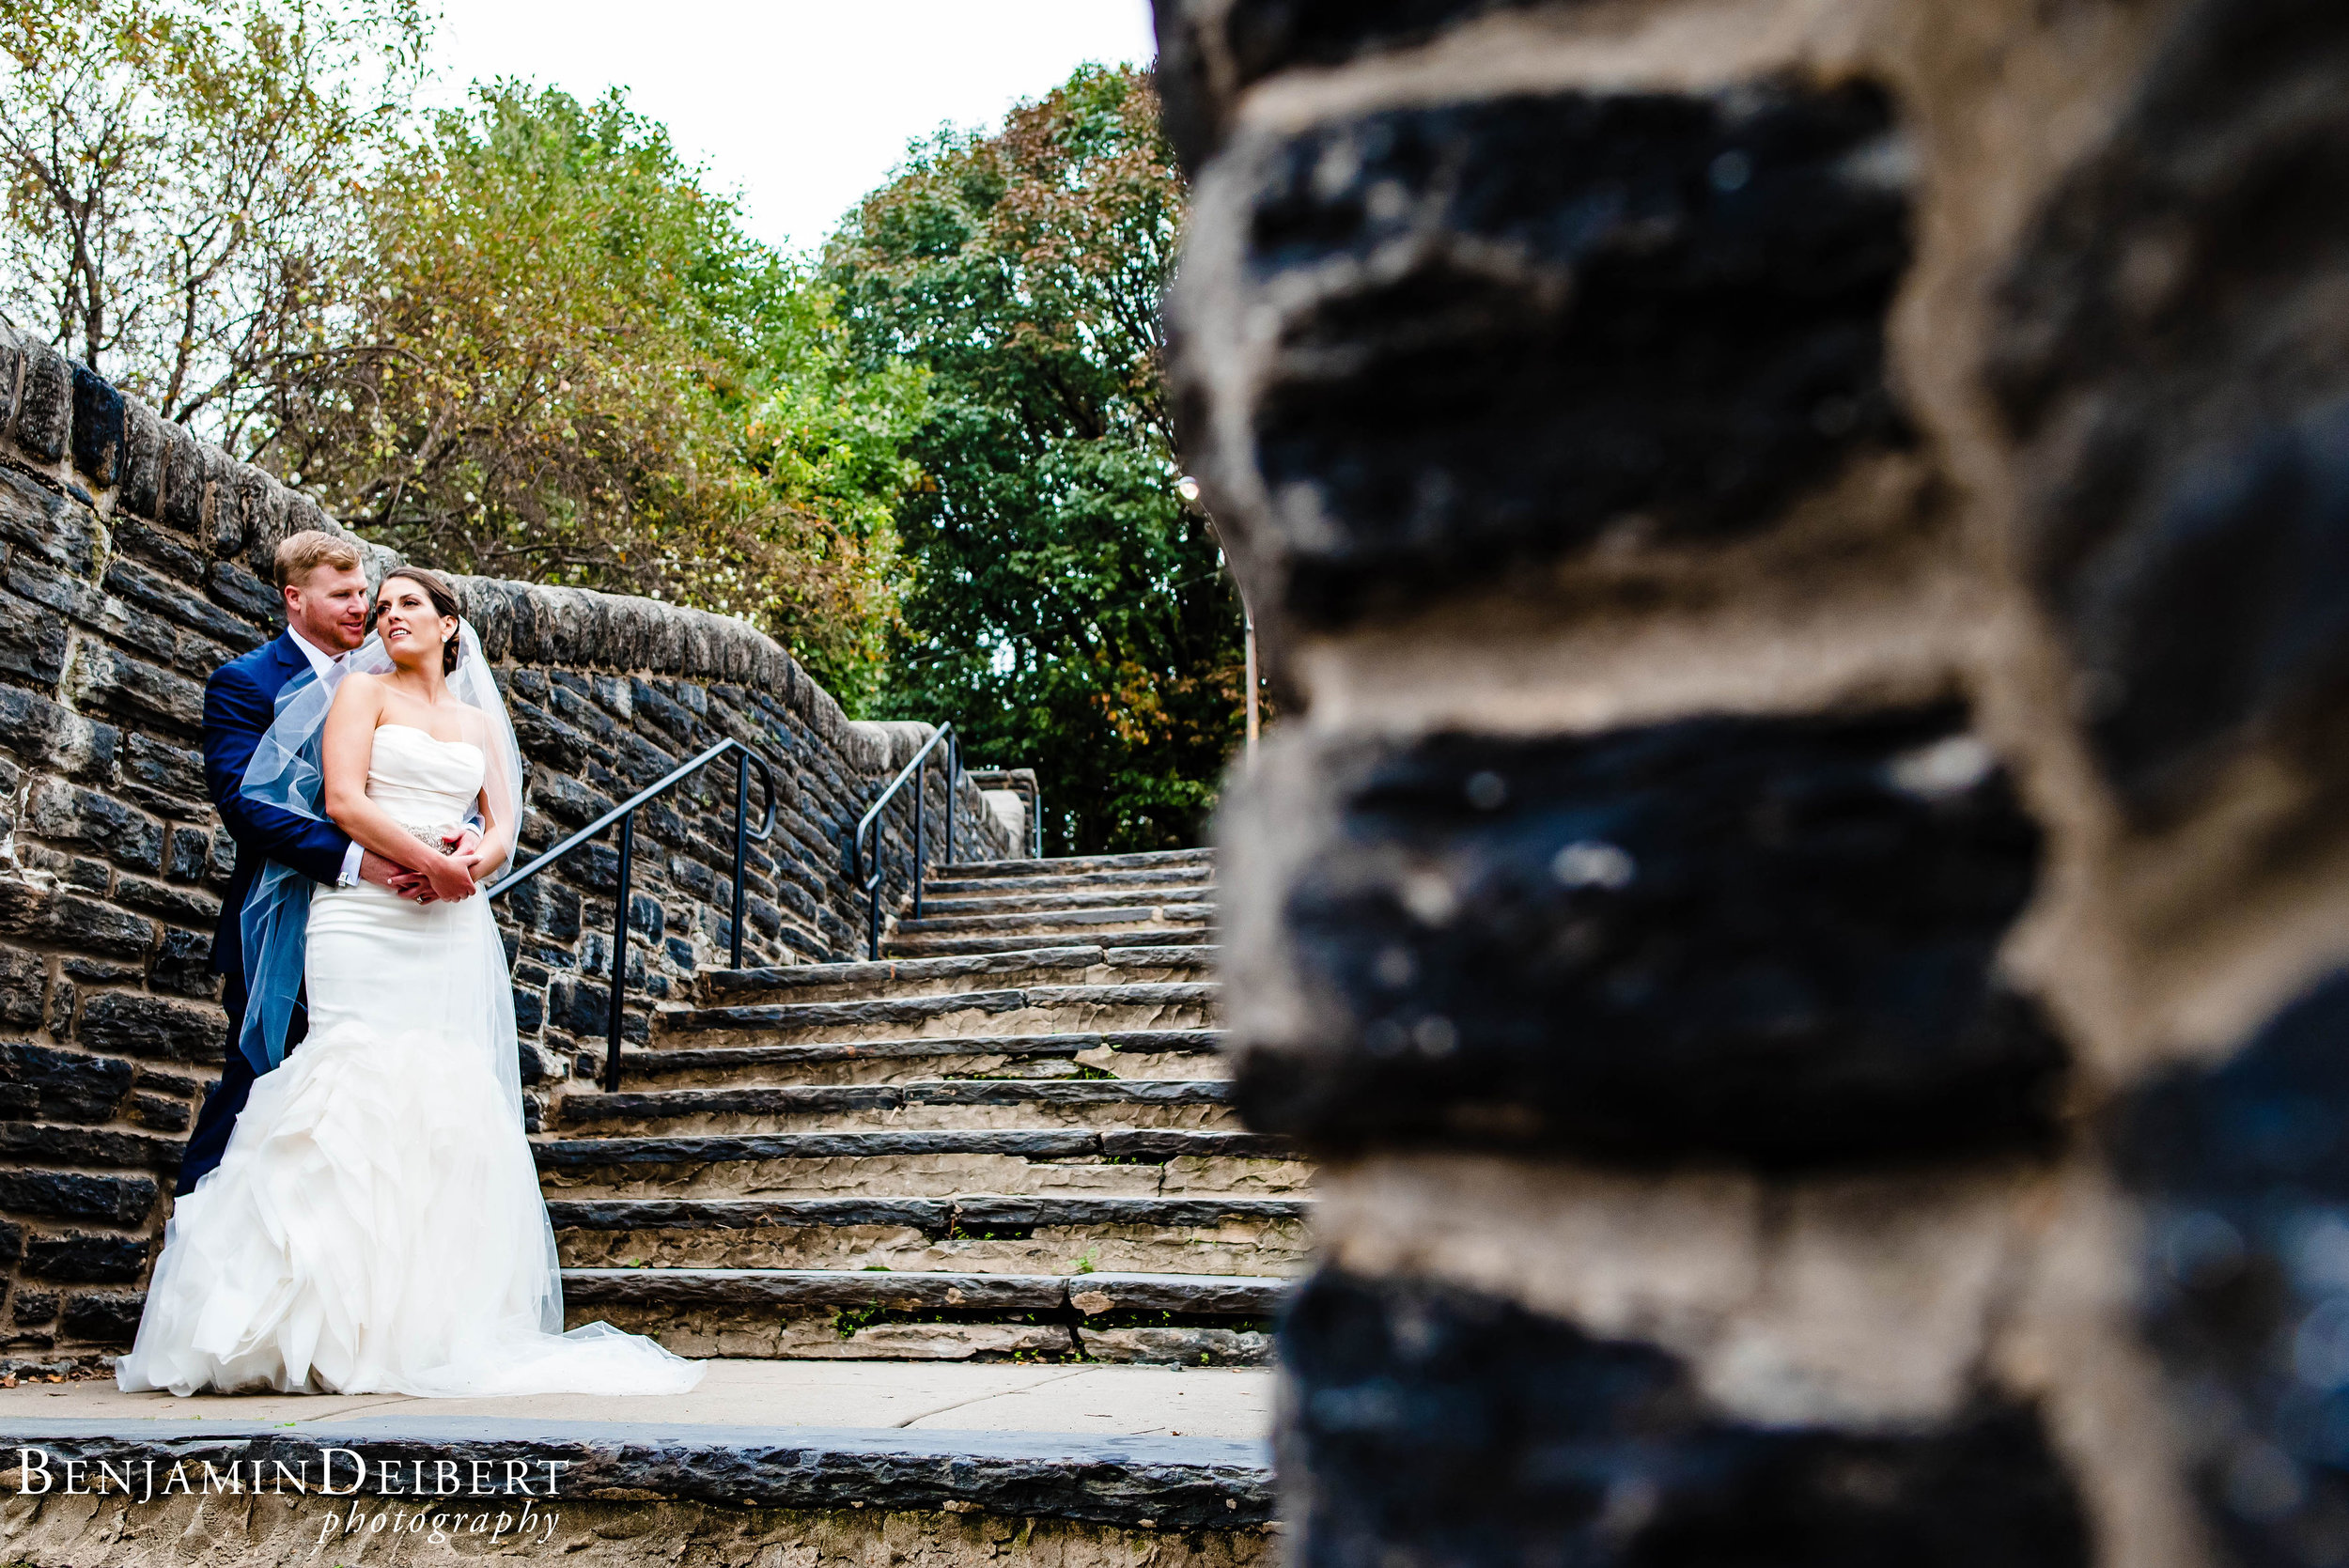 TeghanandChris_BridgemensBallroom_Wedding-61.jpg